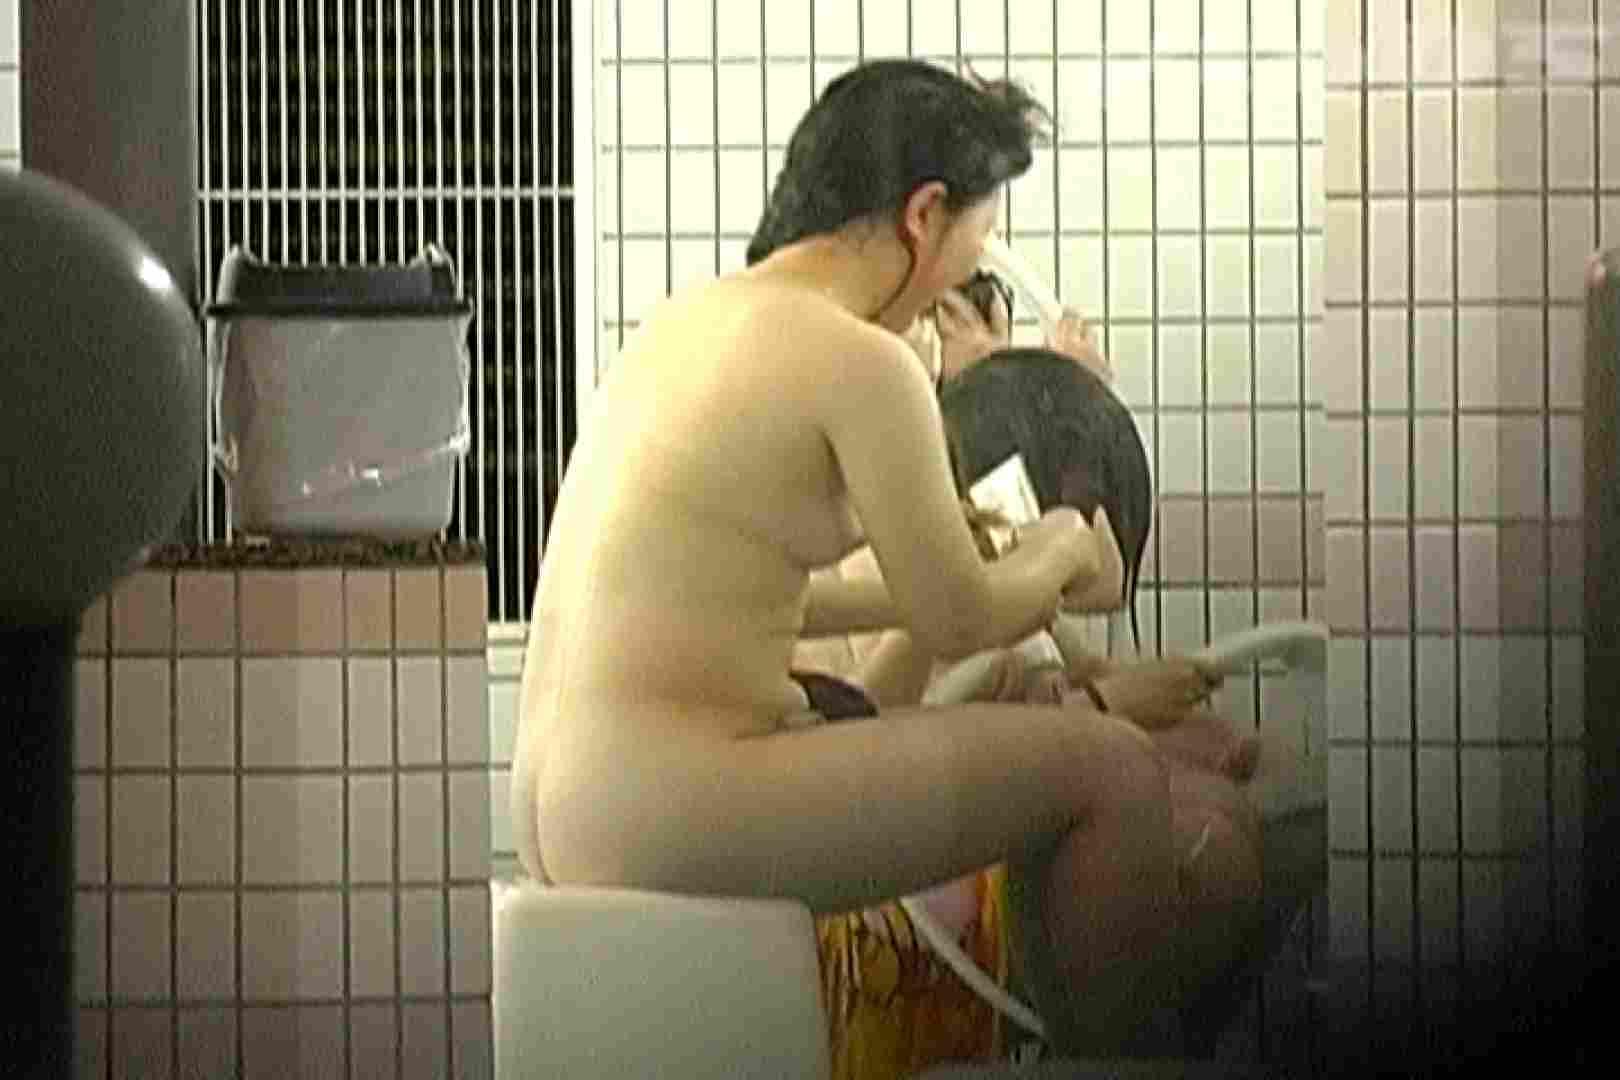 ▲復活限定▲合宿ホテル女風呂盗撮 Vol.27 合宿中の出来事 性交動画流出 95画像 38